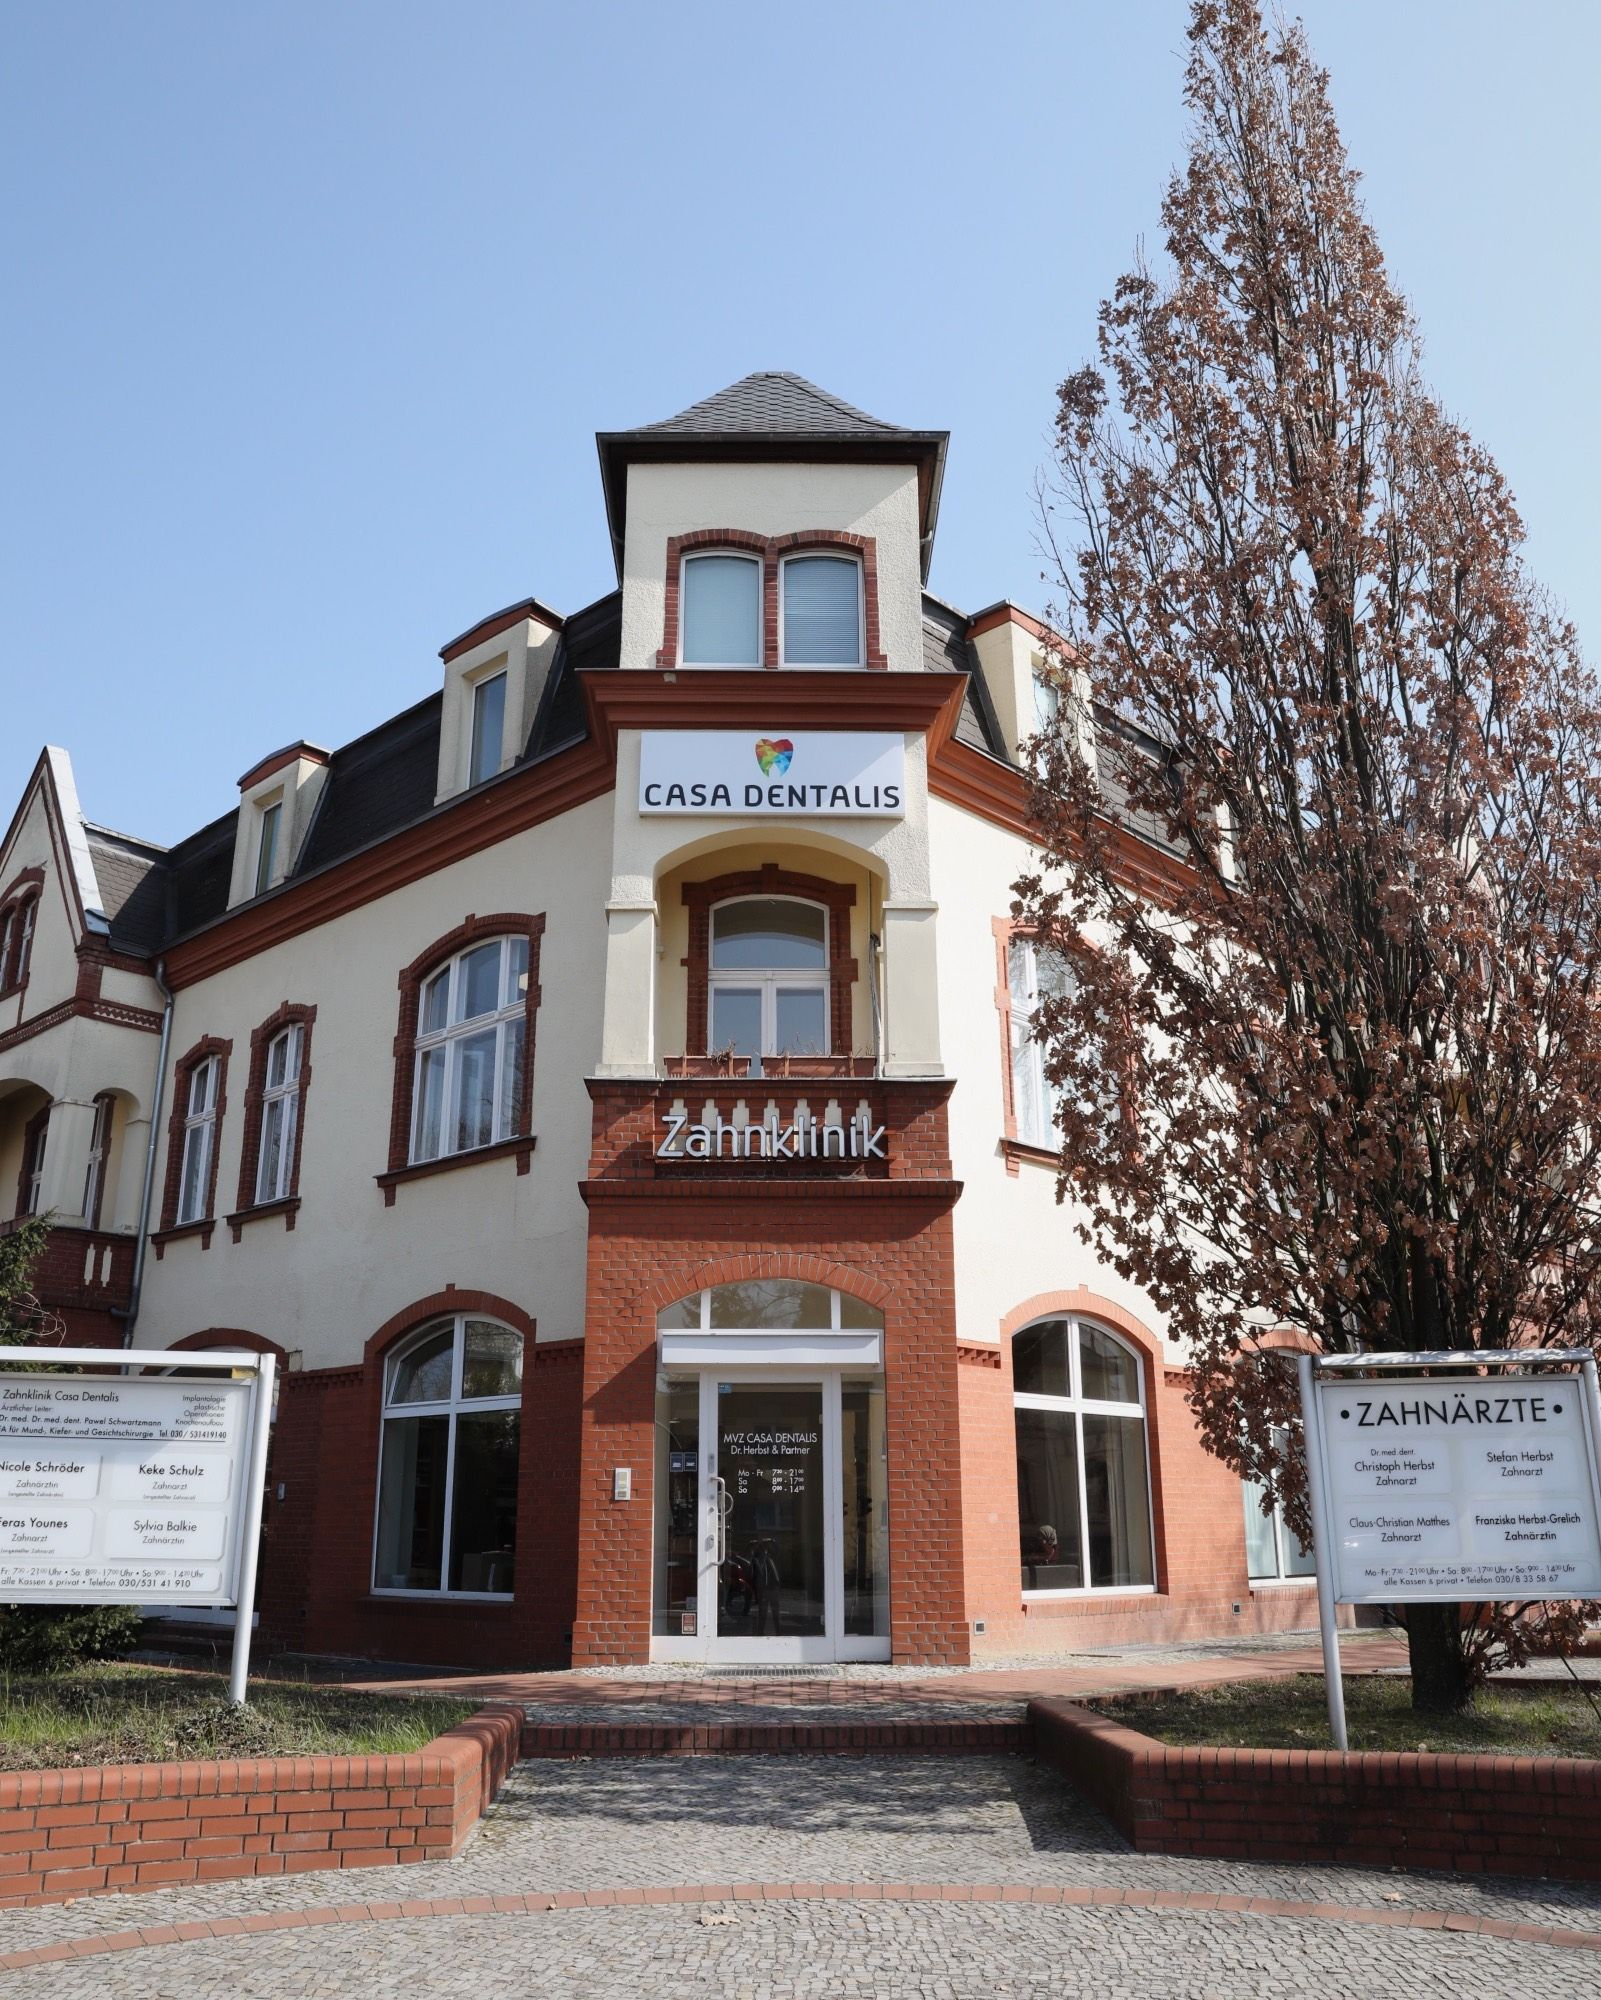 Casa Dentalis Zahnarzt